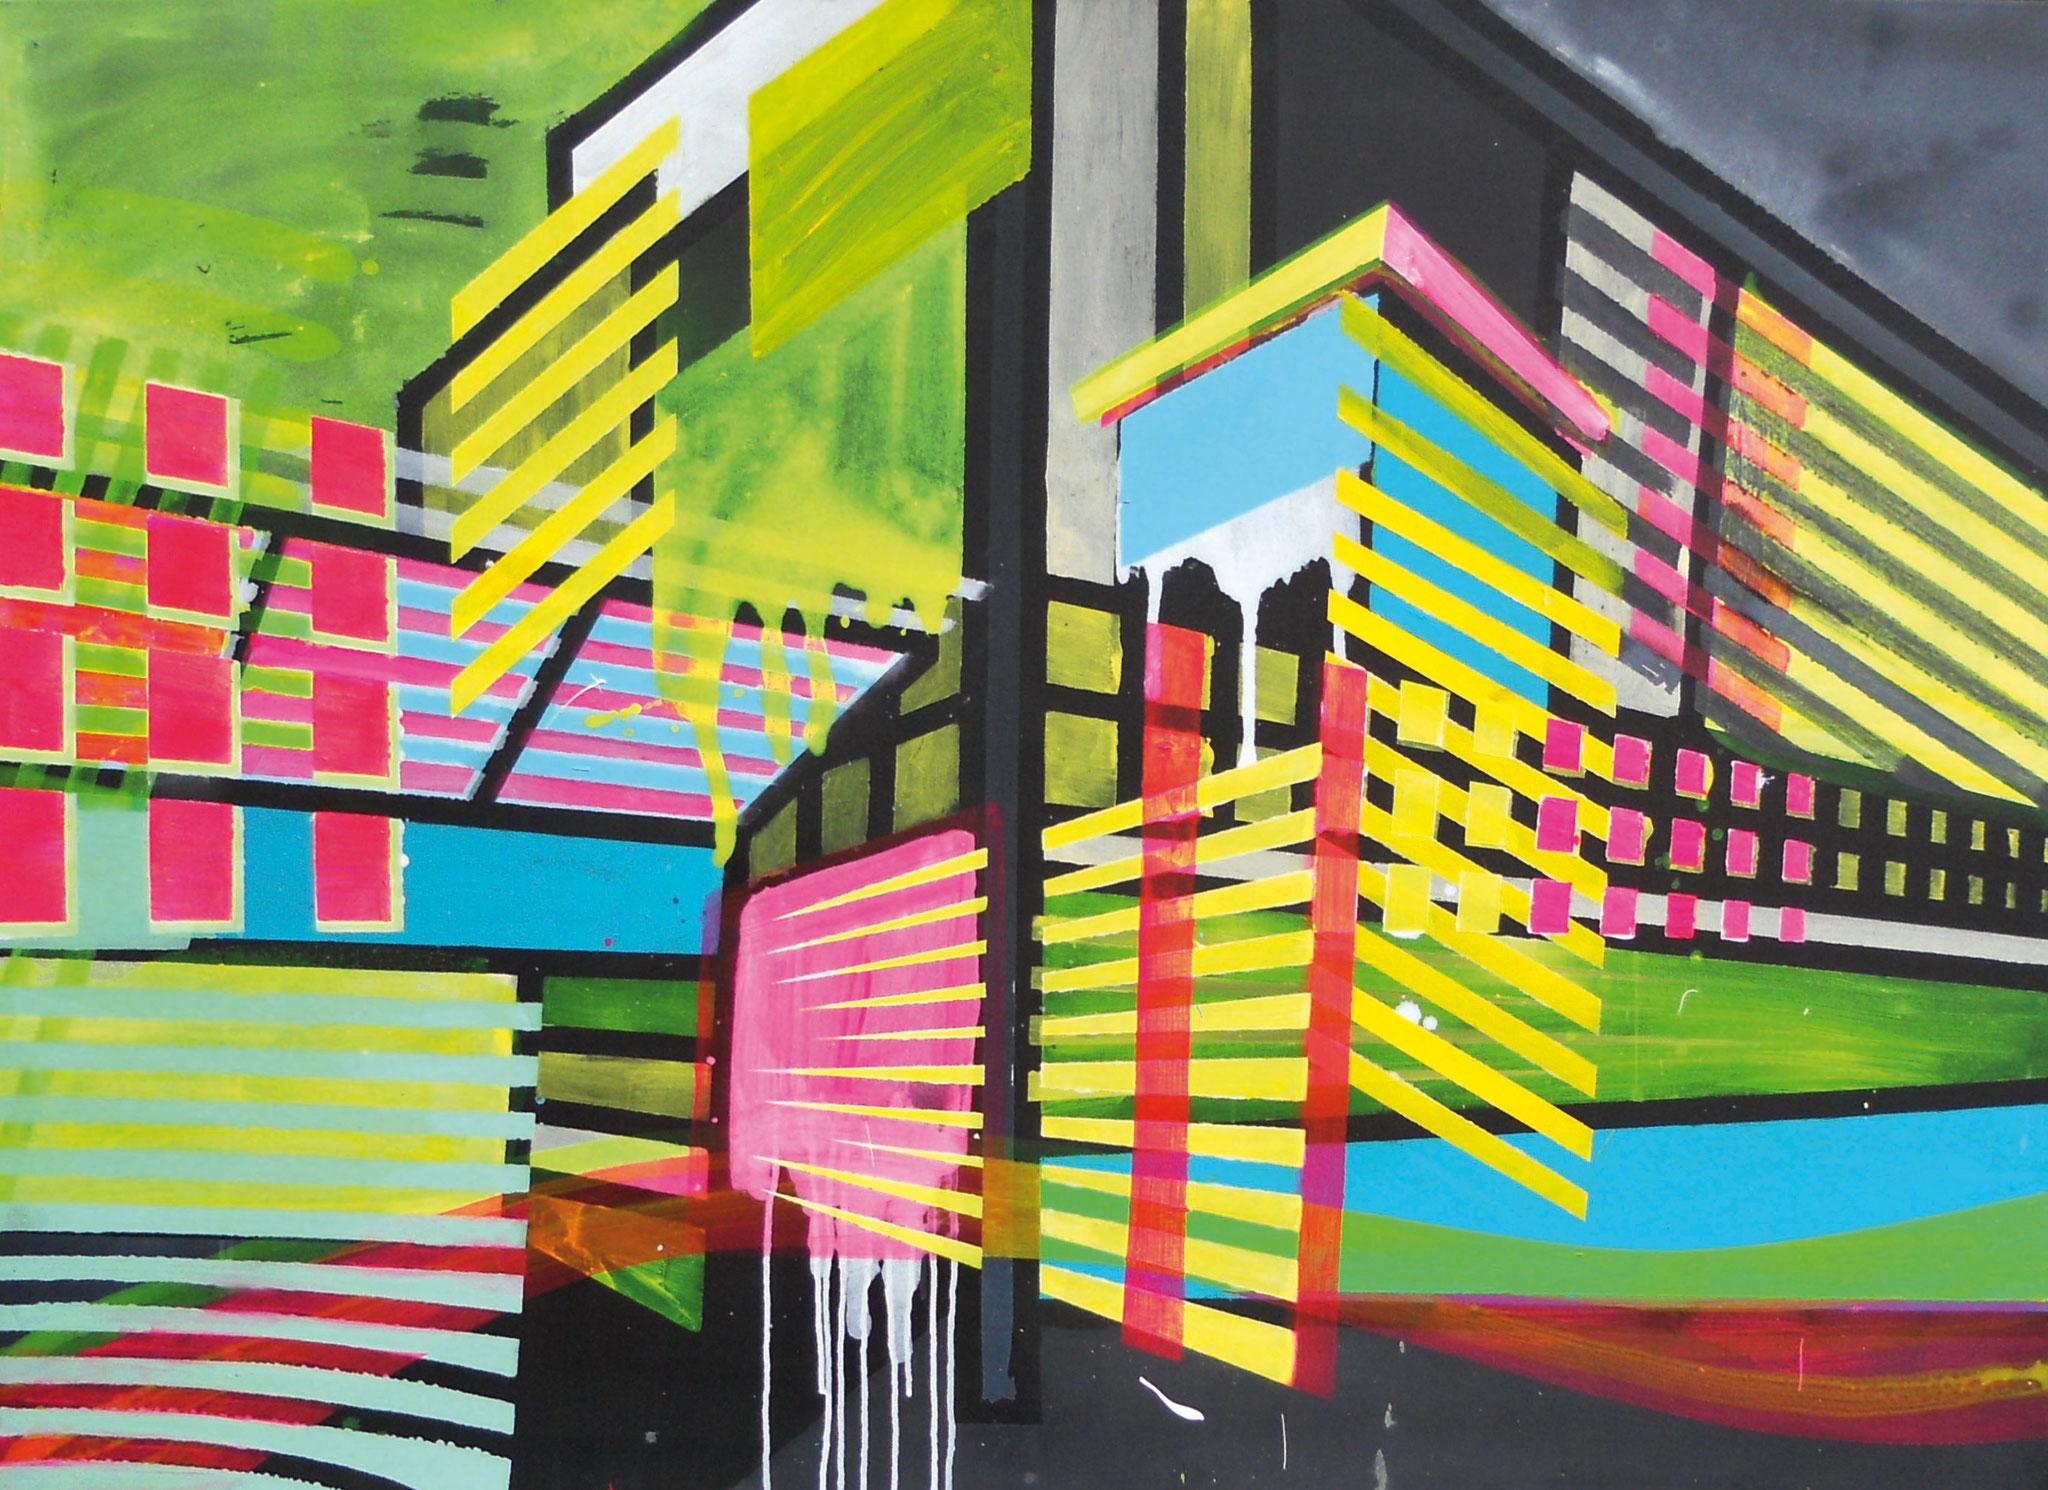 Light&Brigth 11 100x140 cm  2018 Pigmente/Binder auf Leinwand